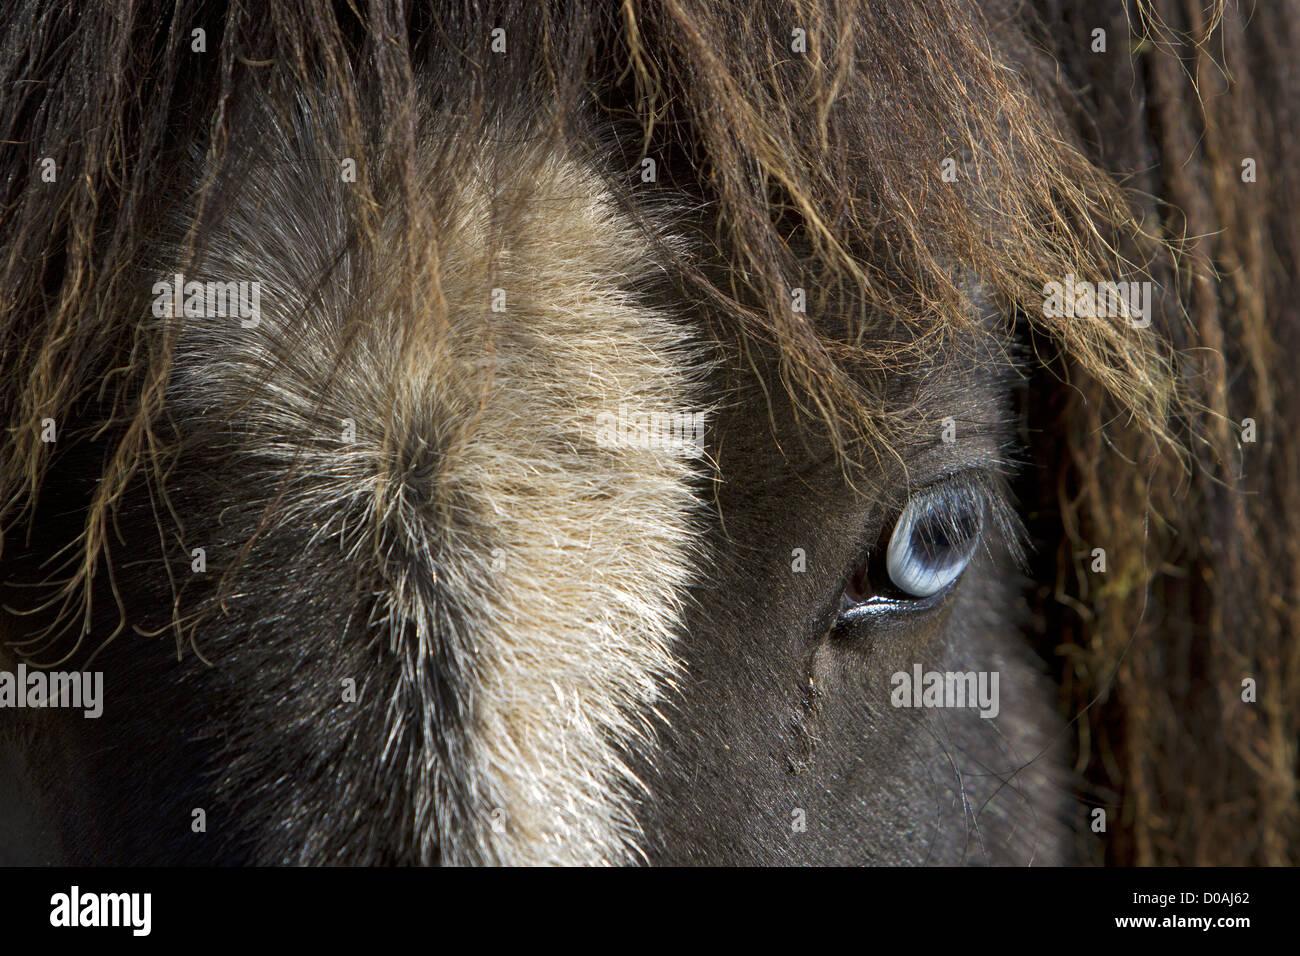 THE BLUE GAZE OF AN ICELANDIC HORSE SKRAPATUNGURETT NORTHERN ICELAND EUROPE - Stock Image